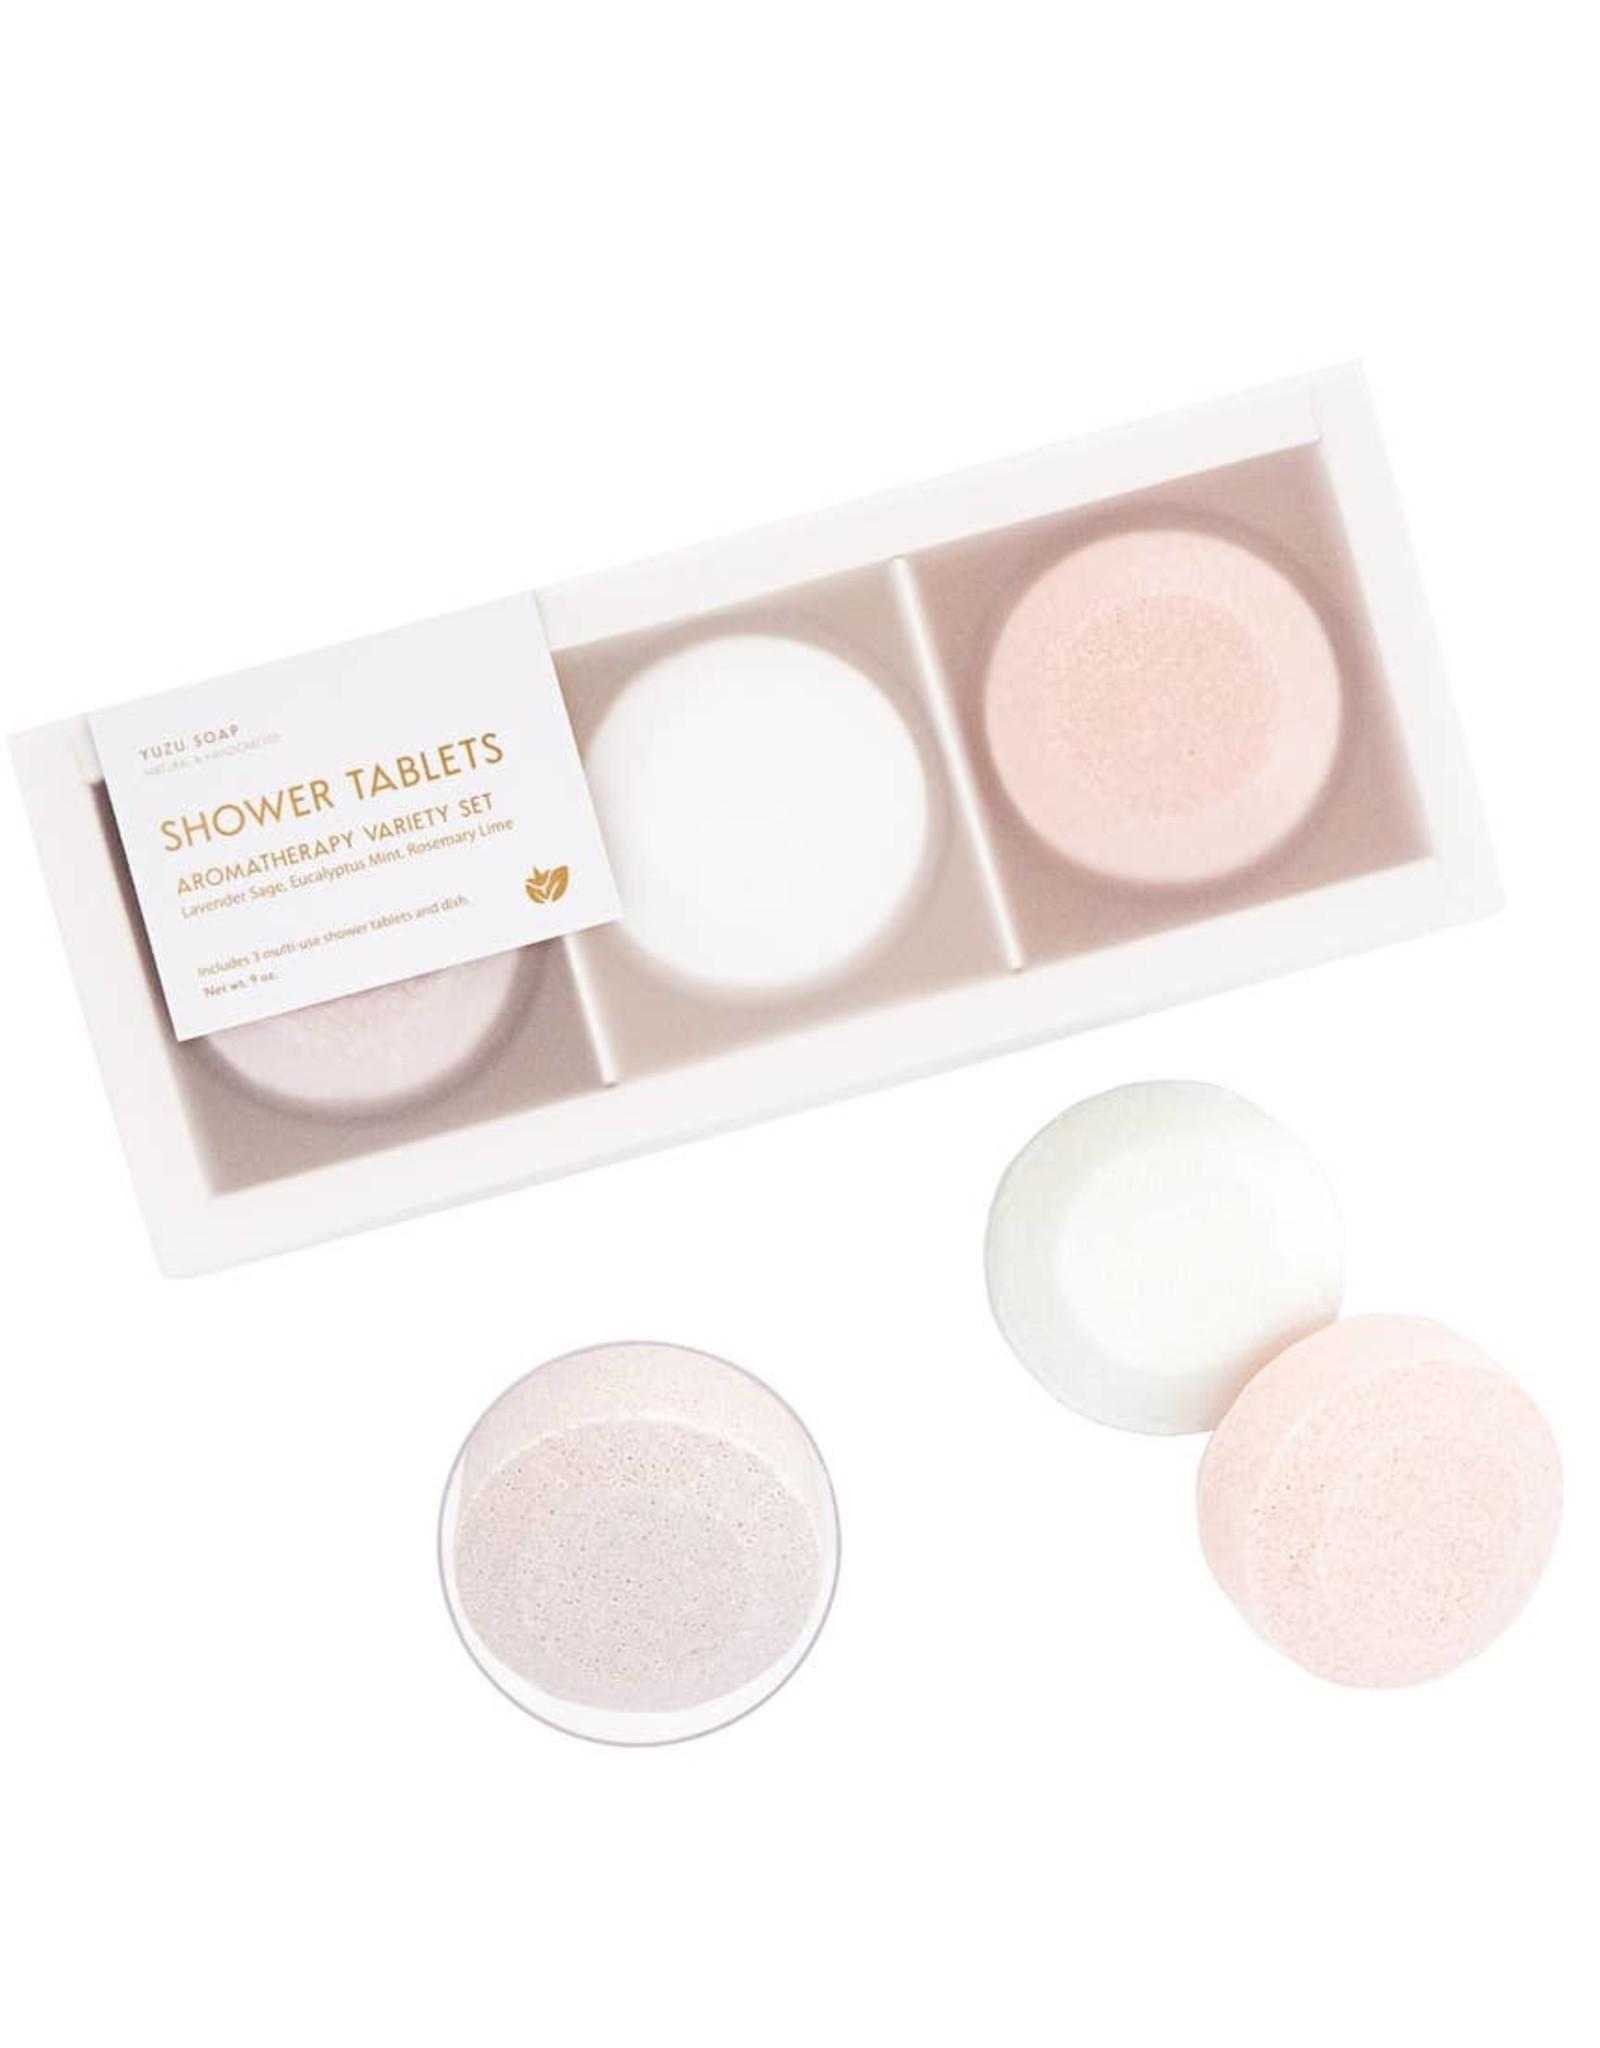 Yuzu Soap Yuzu Soap | Multi-Use Shower Tablets